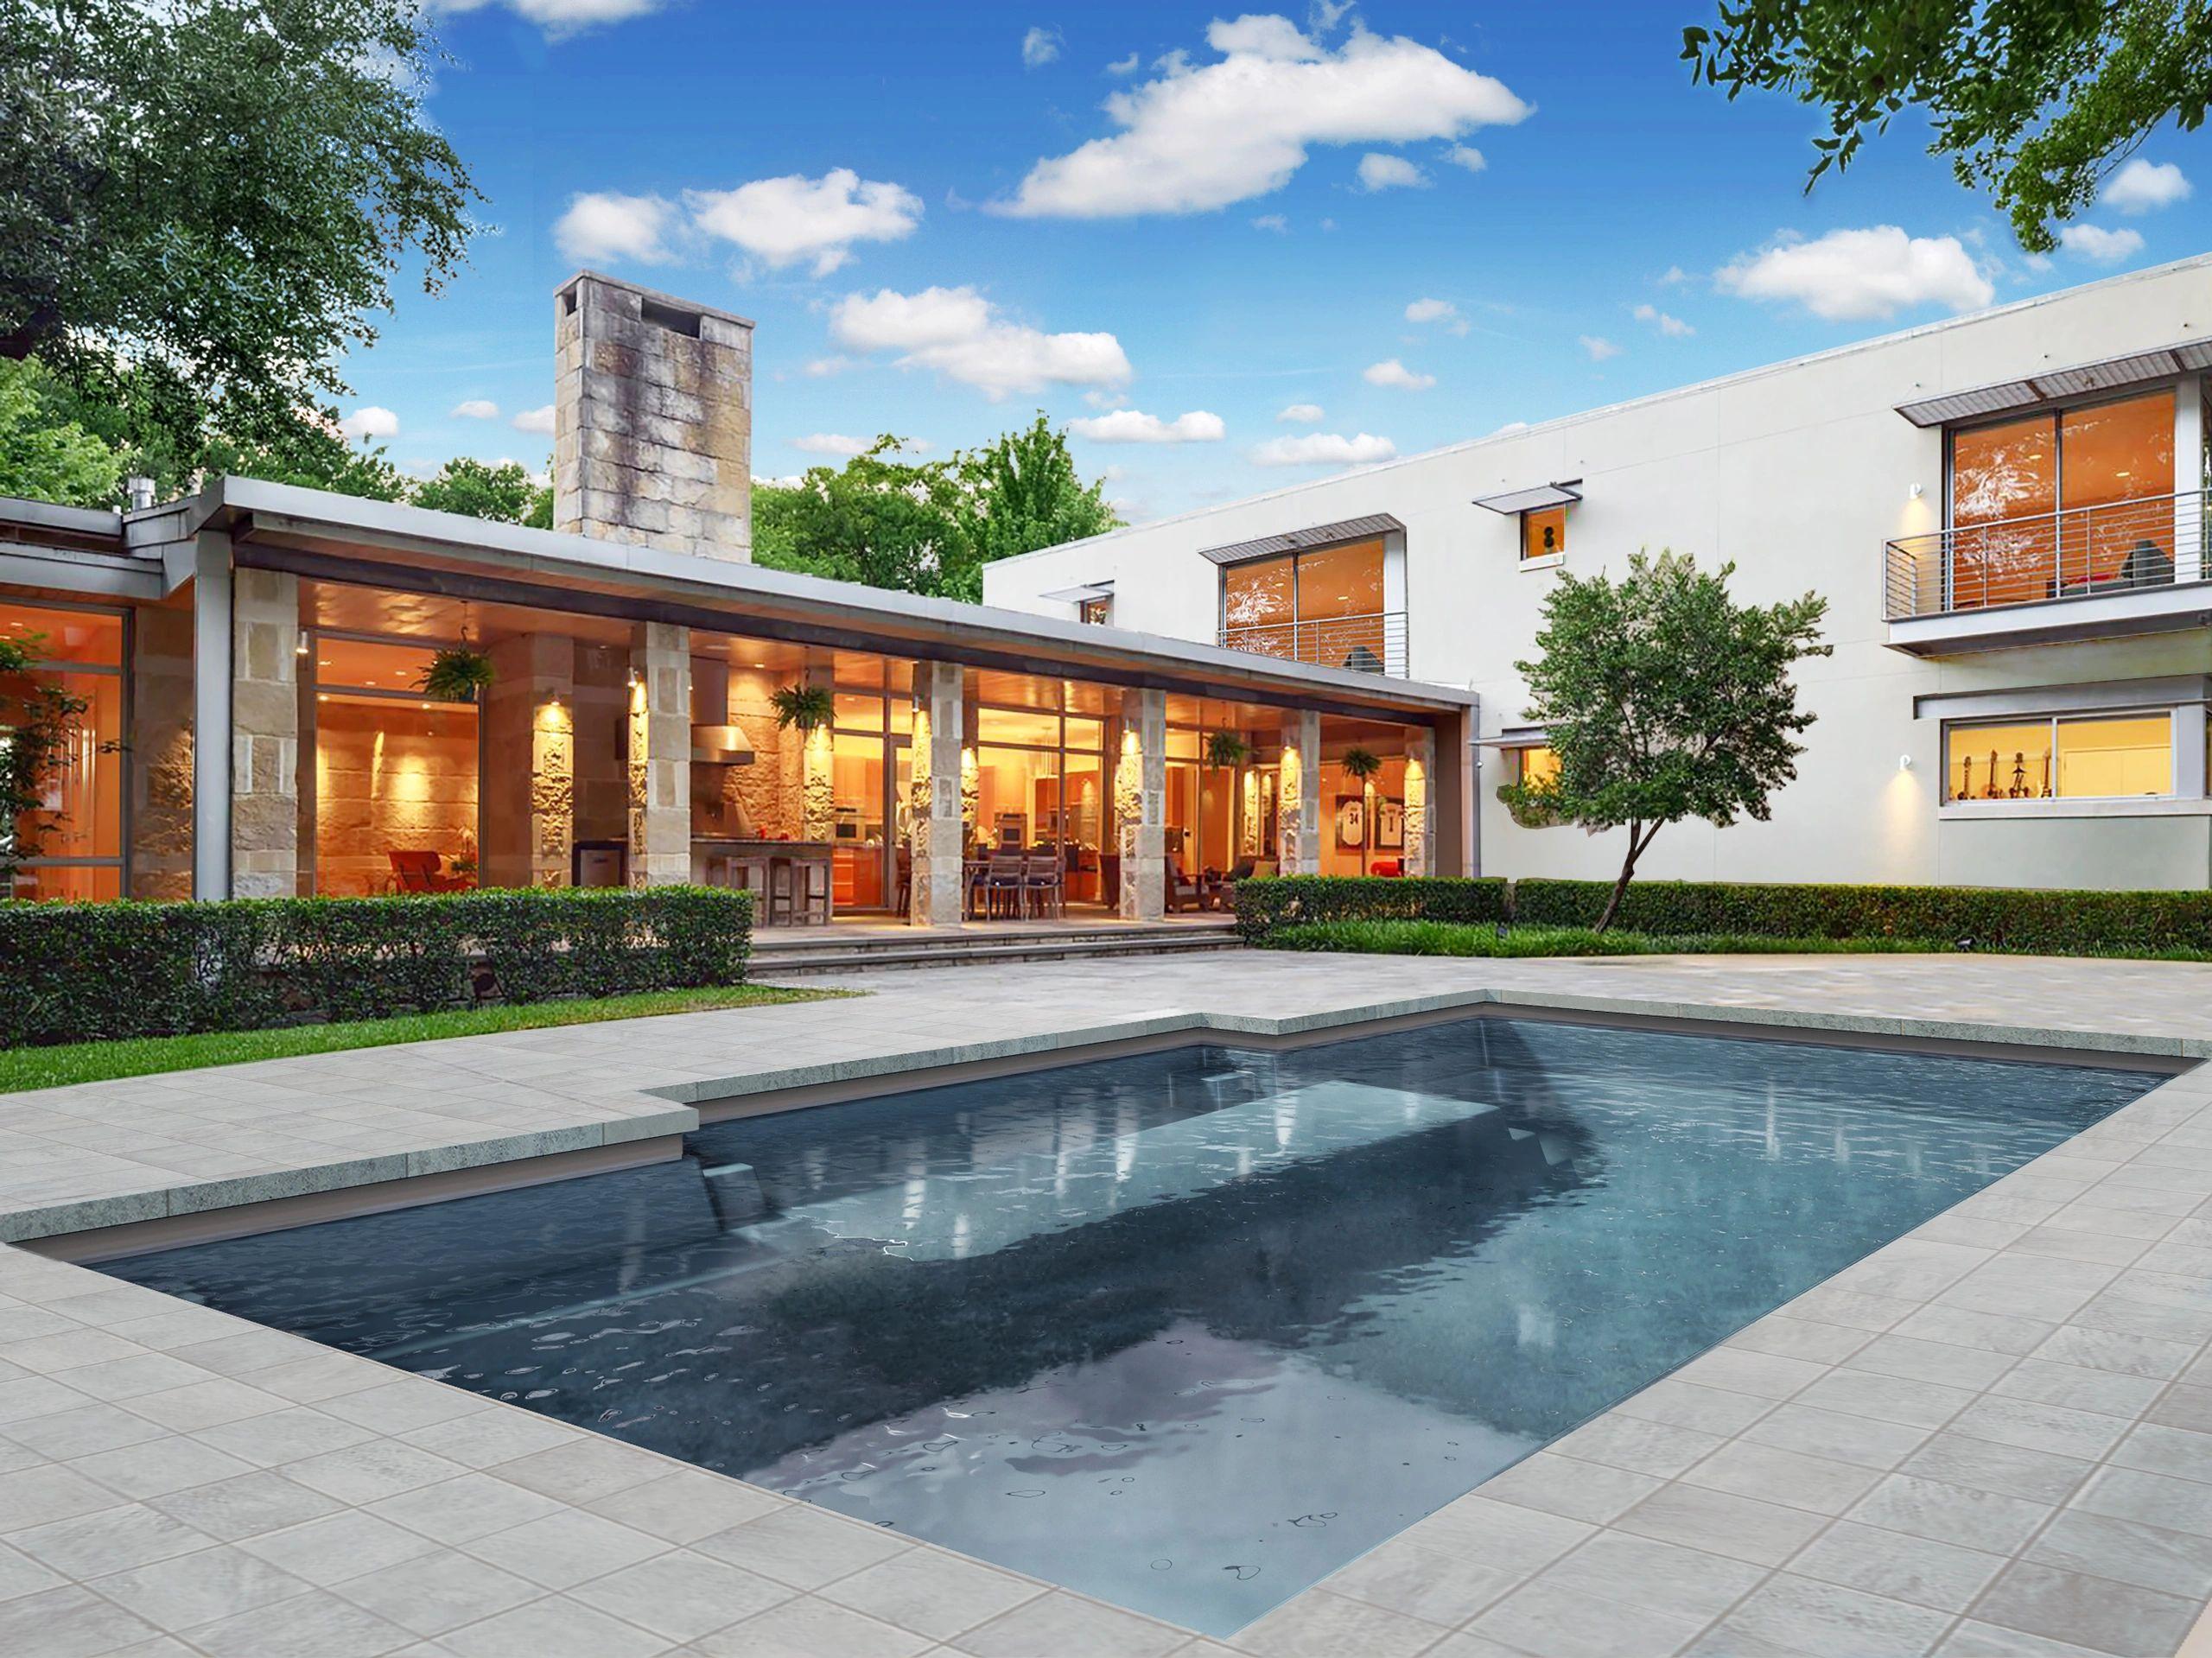 AVIVA Pools for Texas